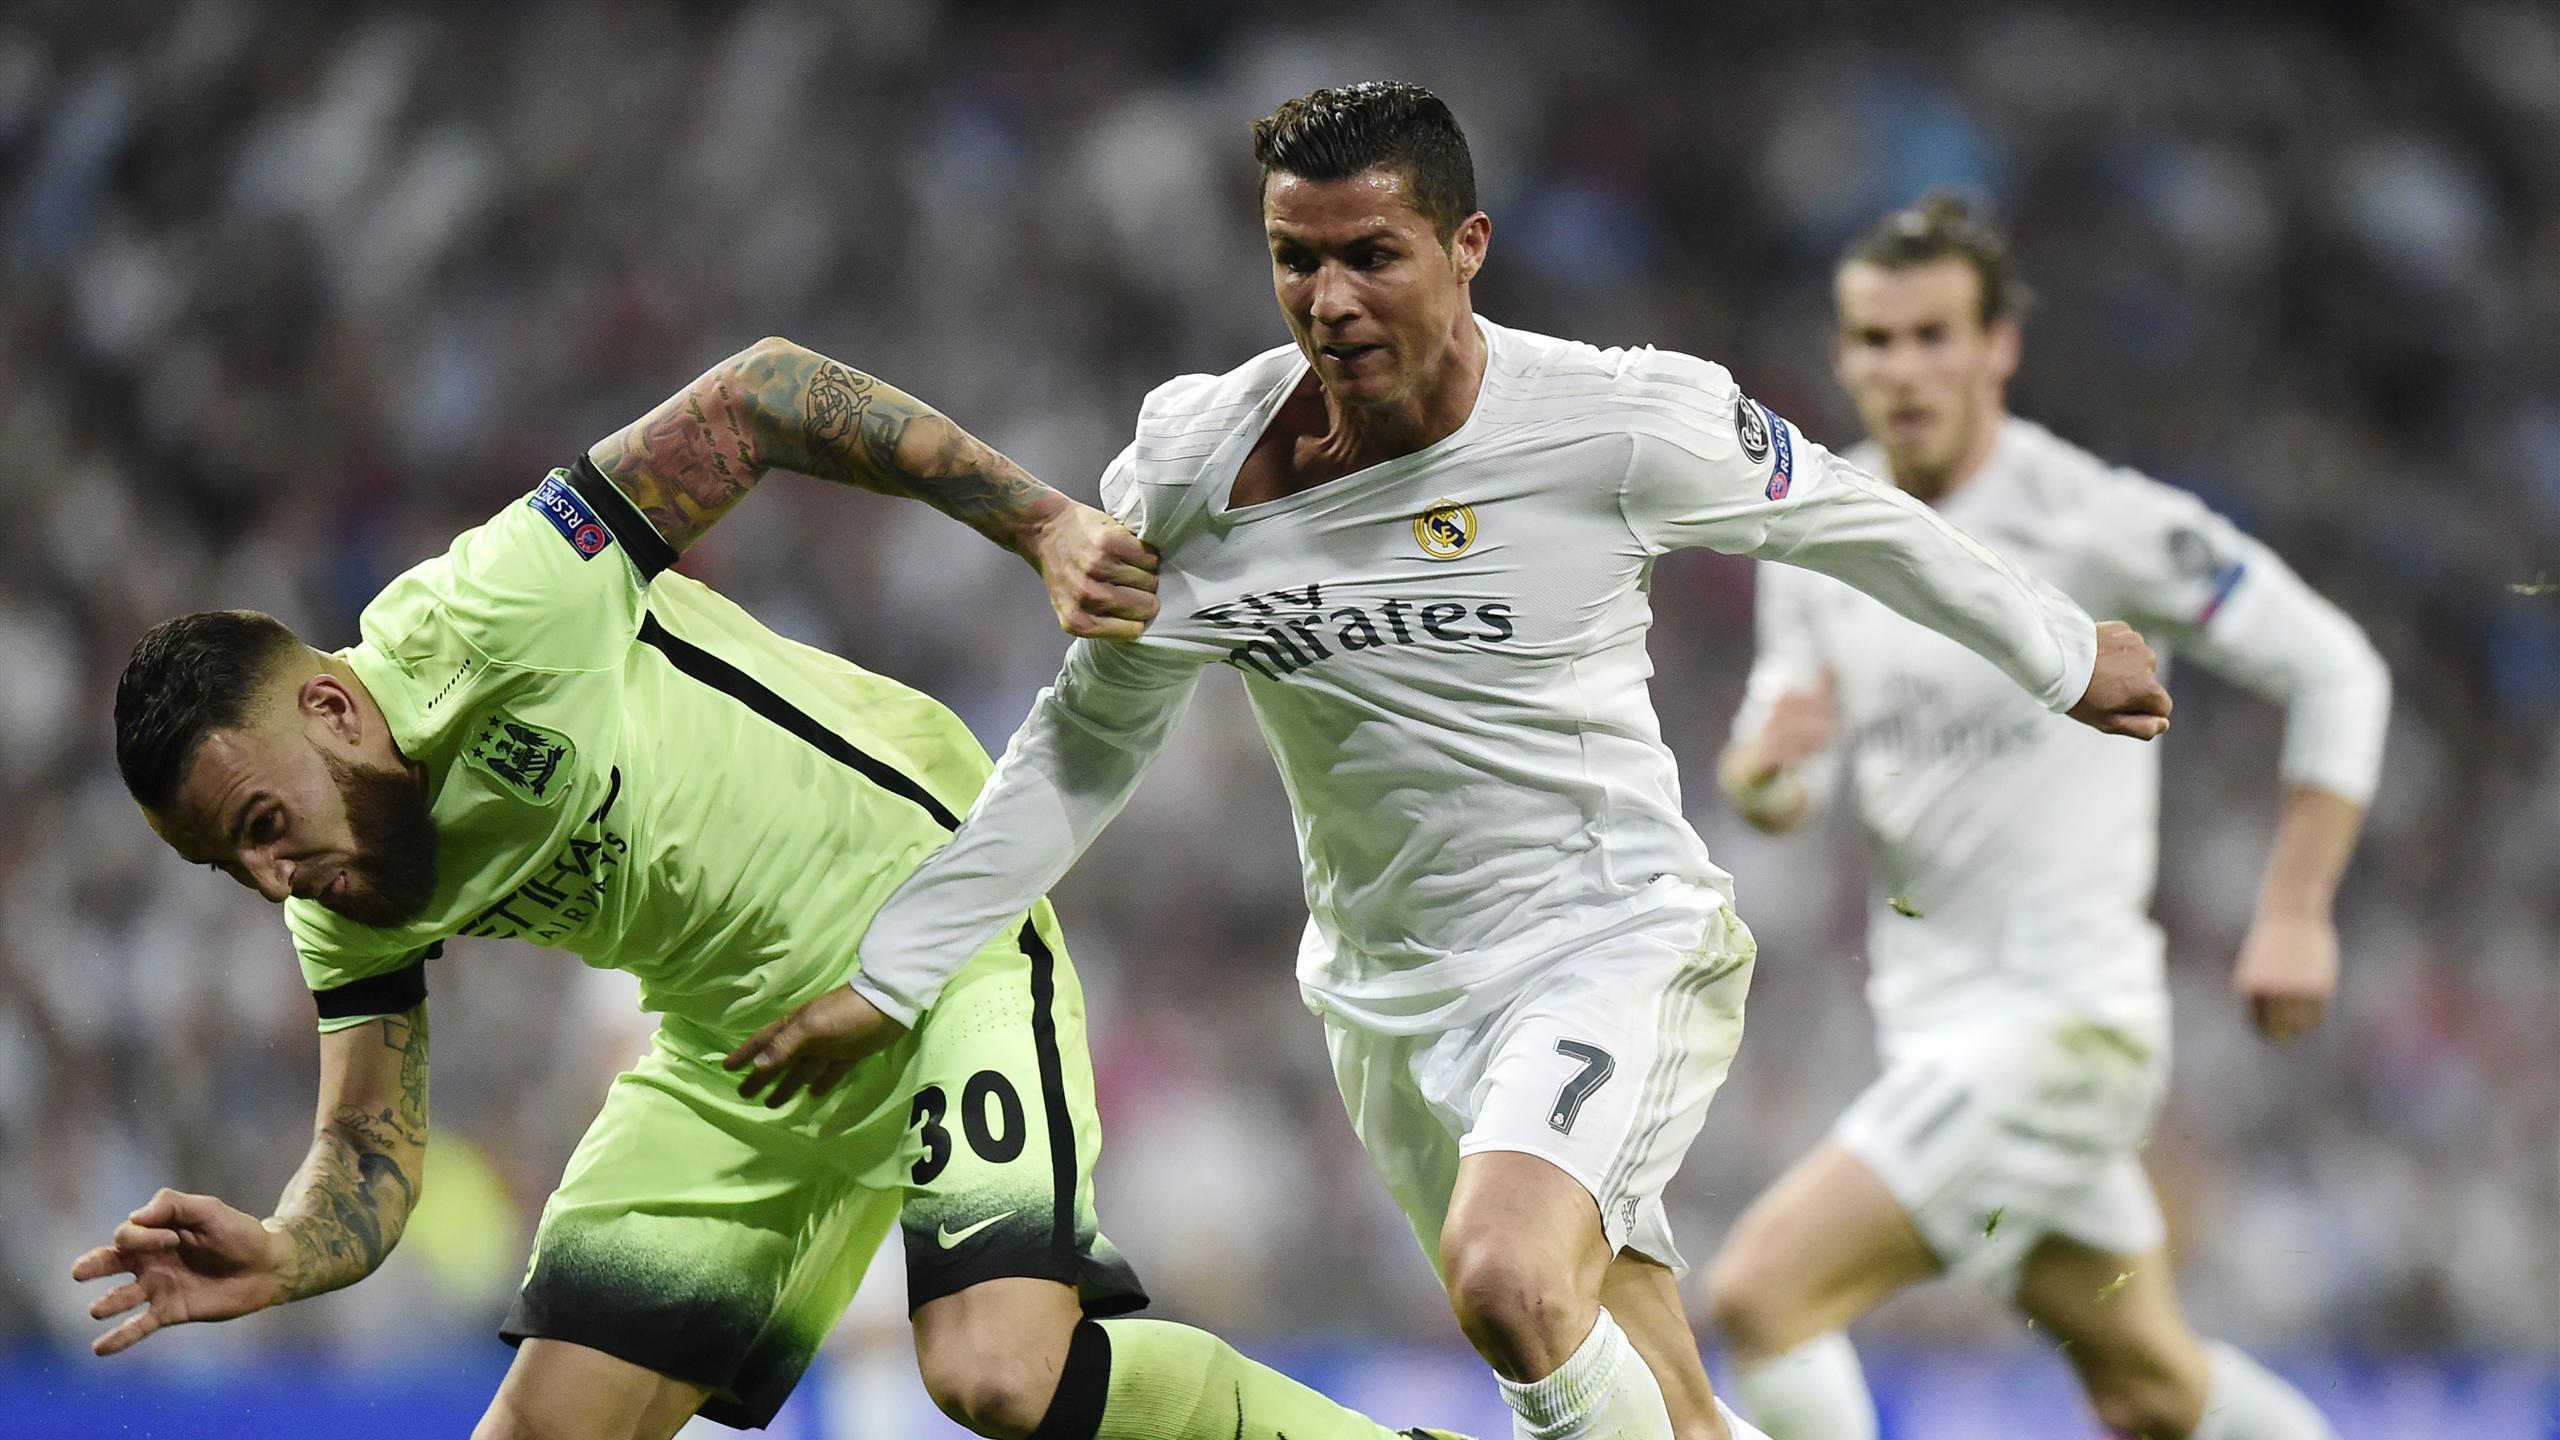 Real Madrid's Portuguese forward Cristiano Ronaldo (C) vies with Manchester City's Argentinian defender Nicolas Otamendi (L)